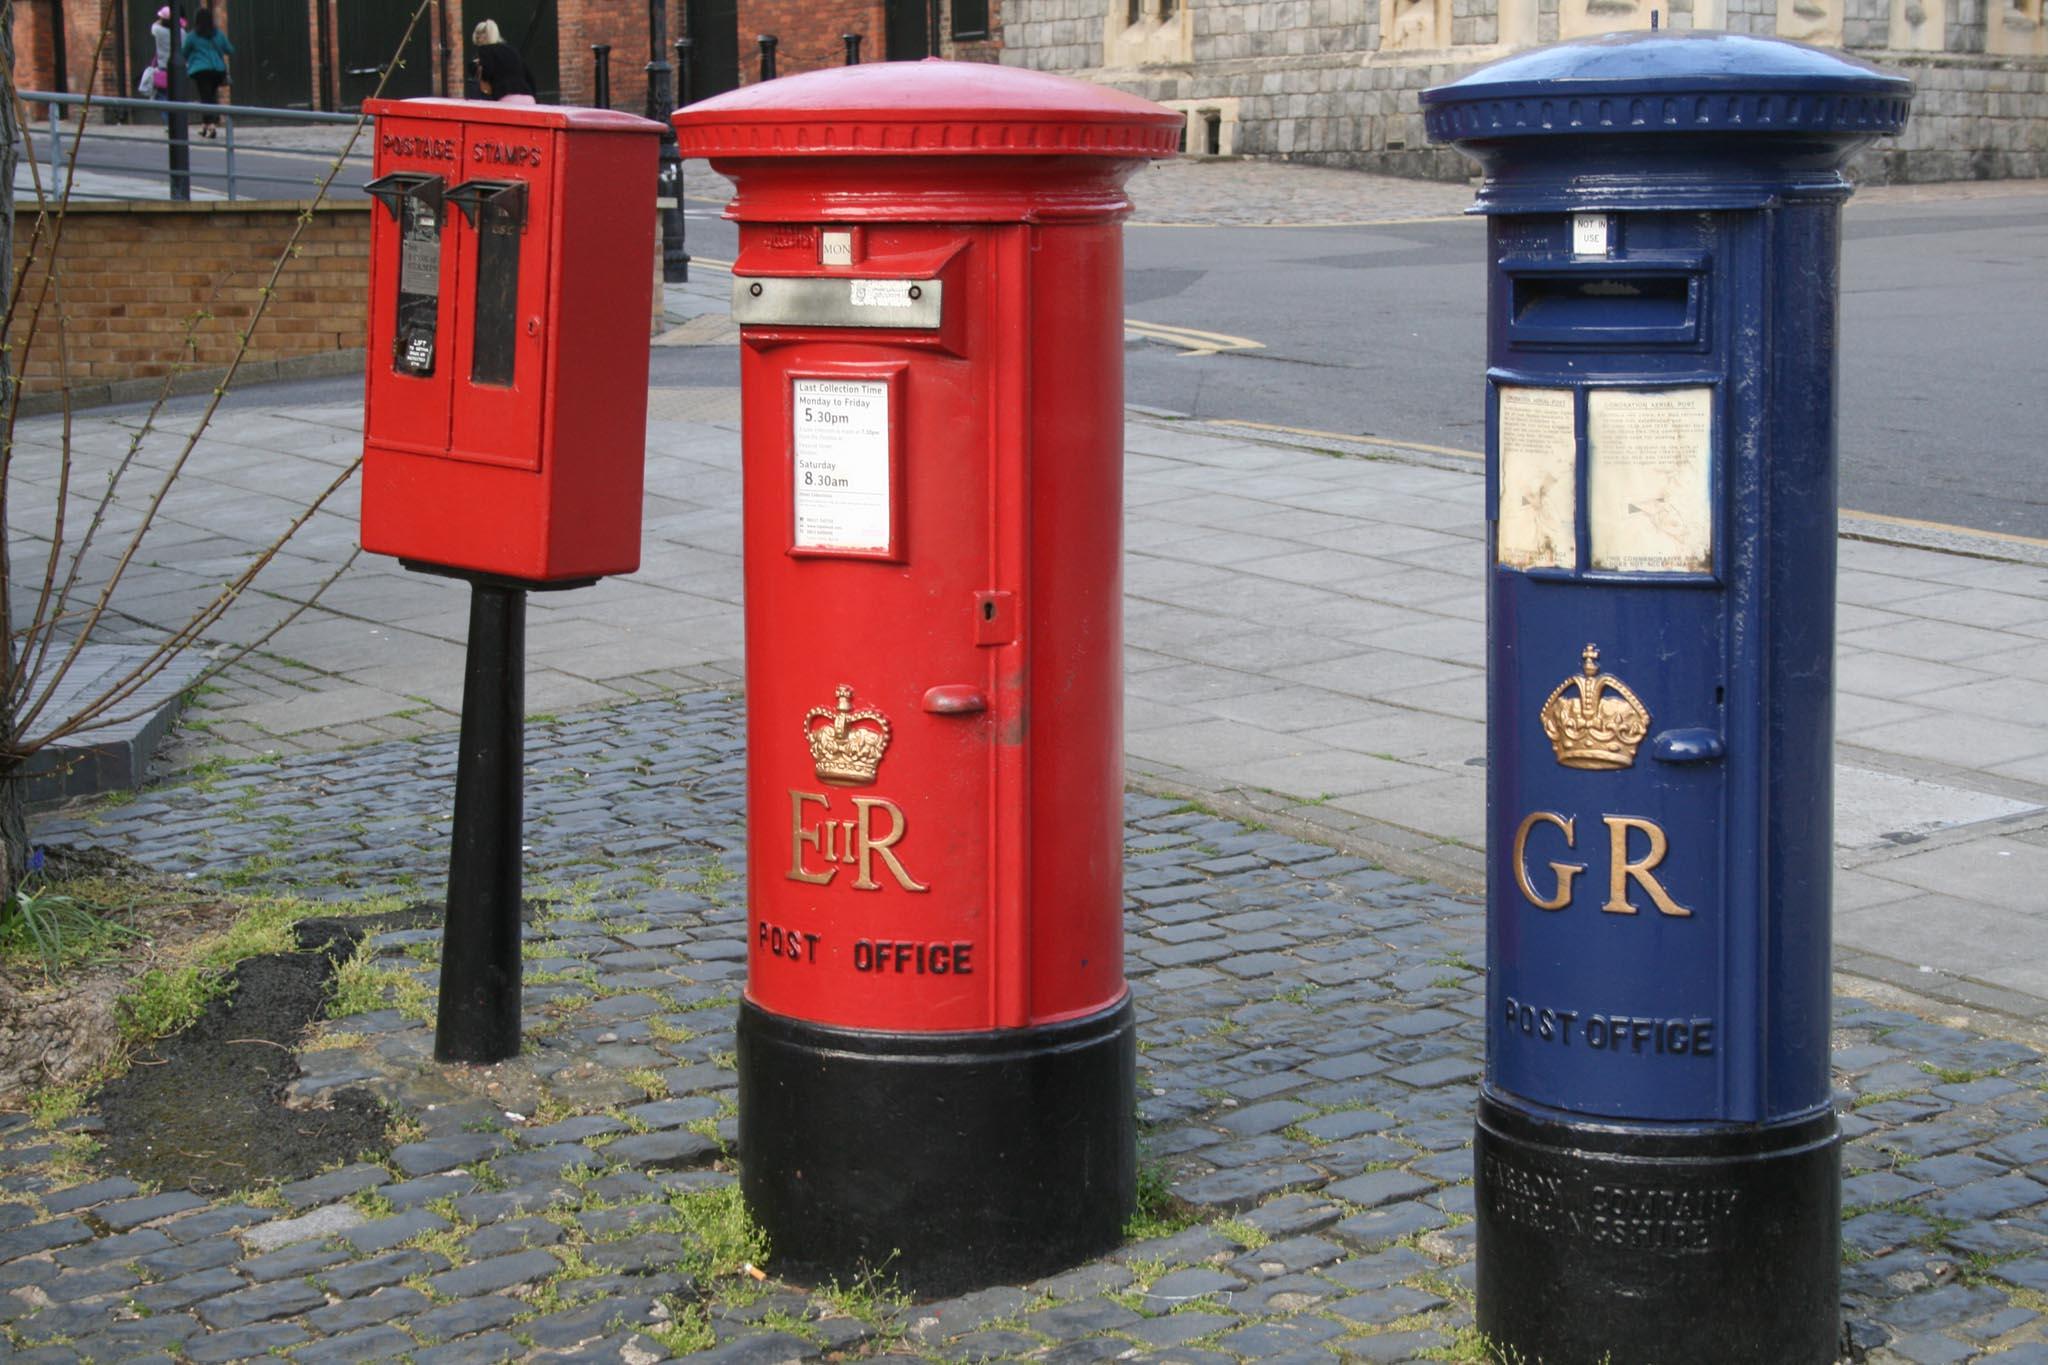 GR Airmail pillar box 1930s, with later E2R, Berks. Robert Cole